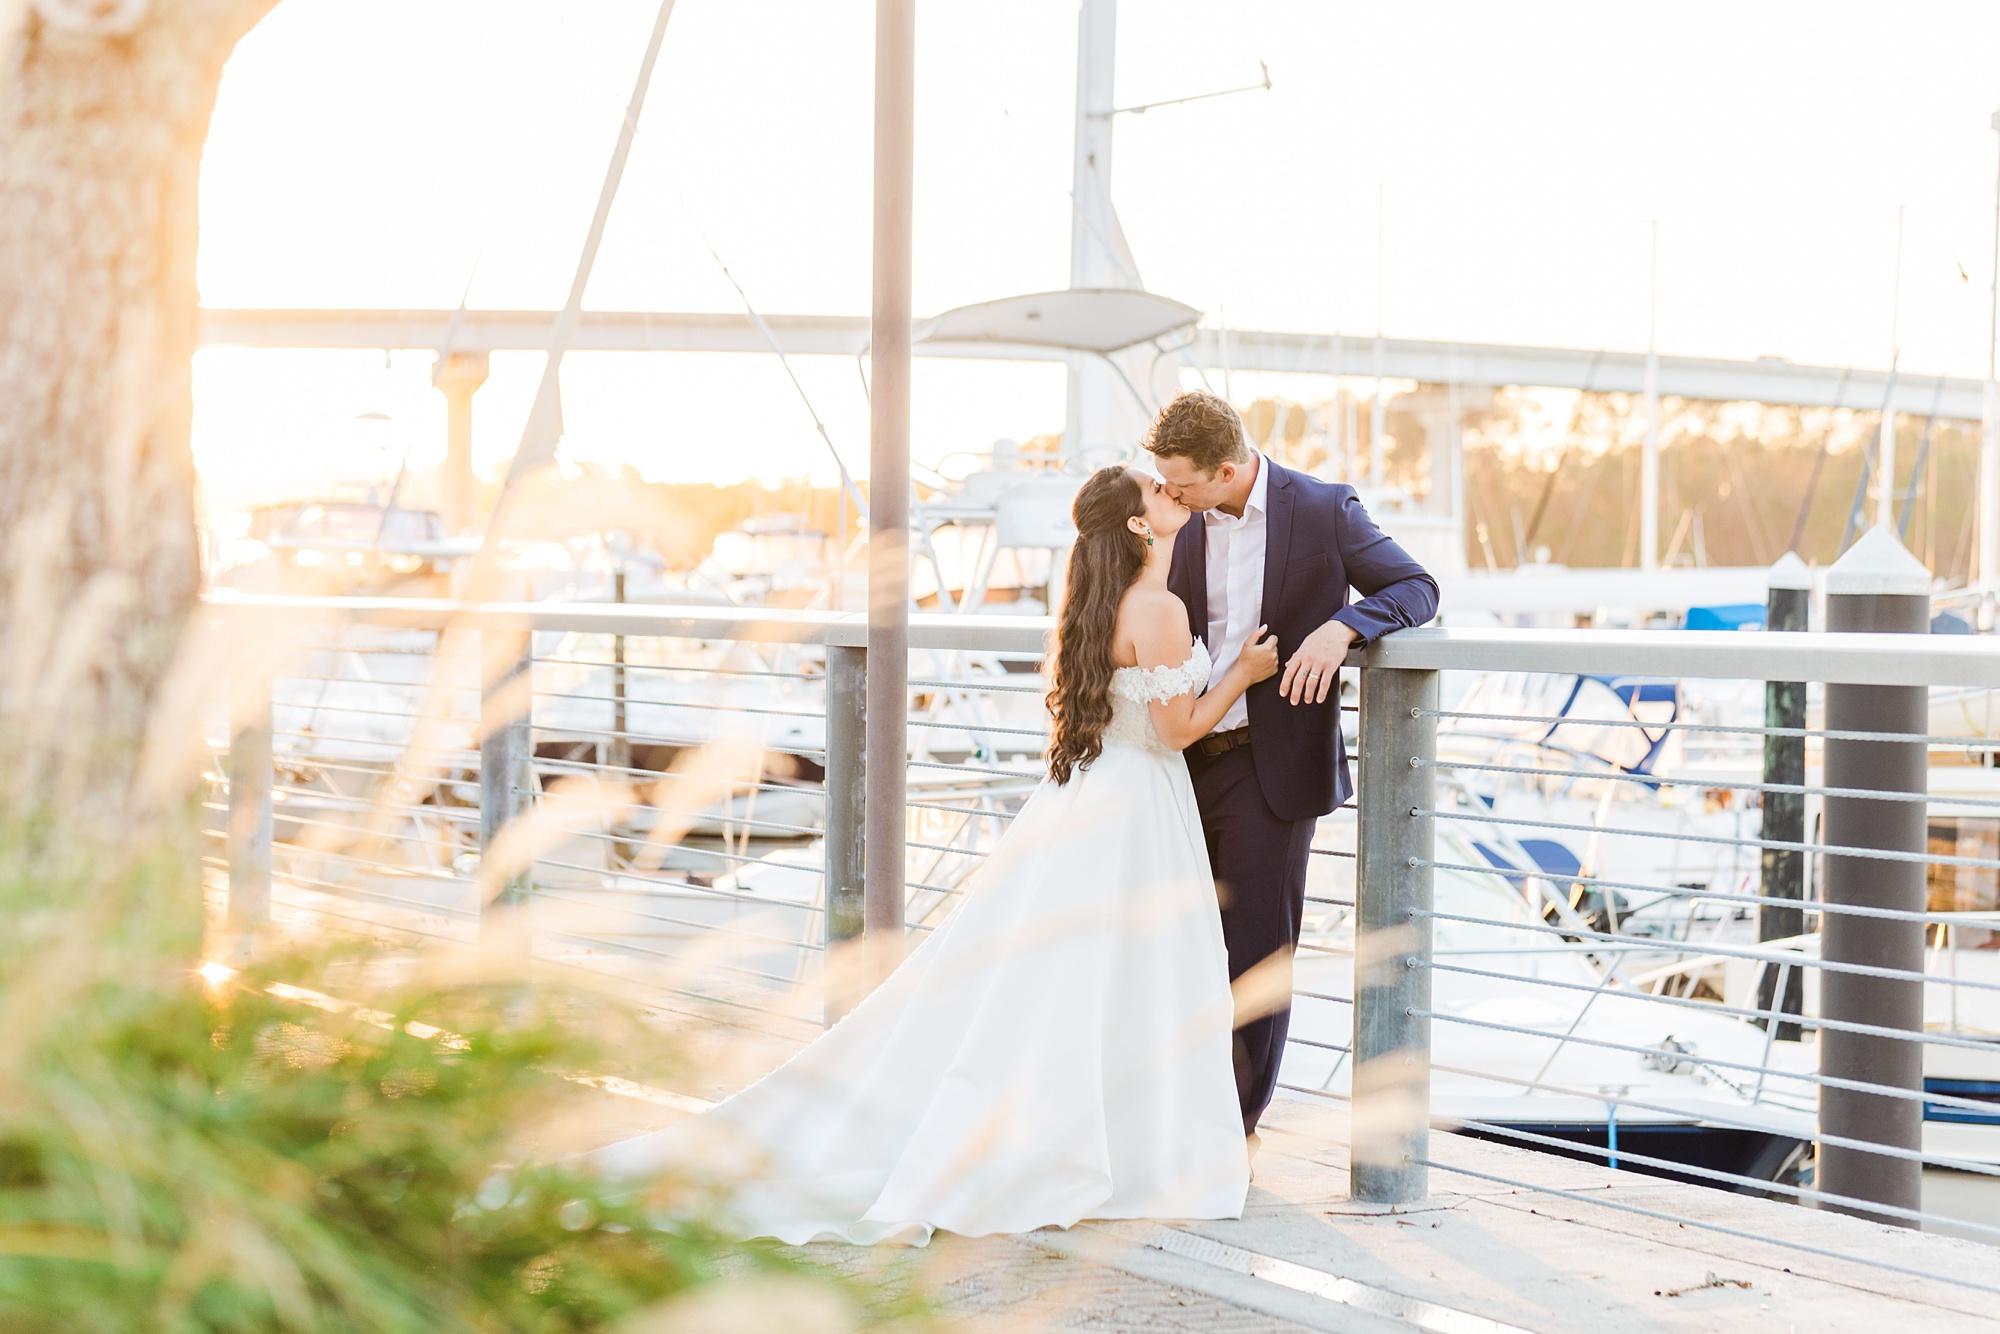 newlyweds pose on dock at Orange Beach at sunset